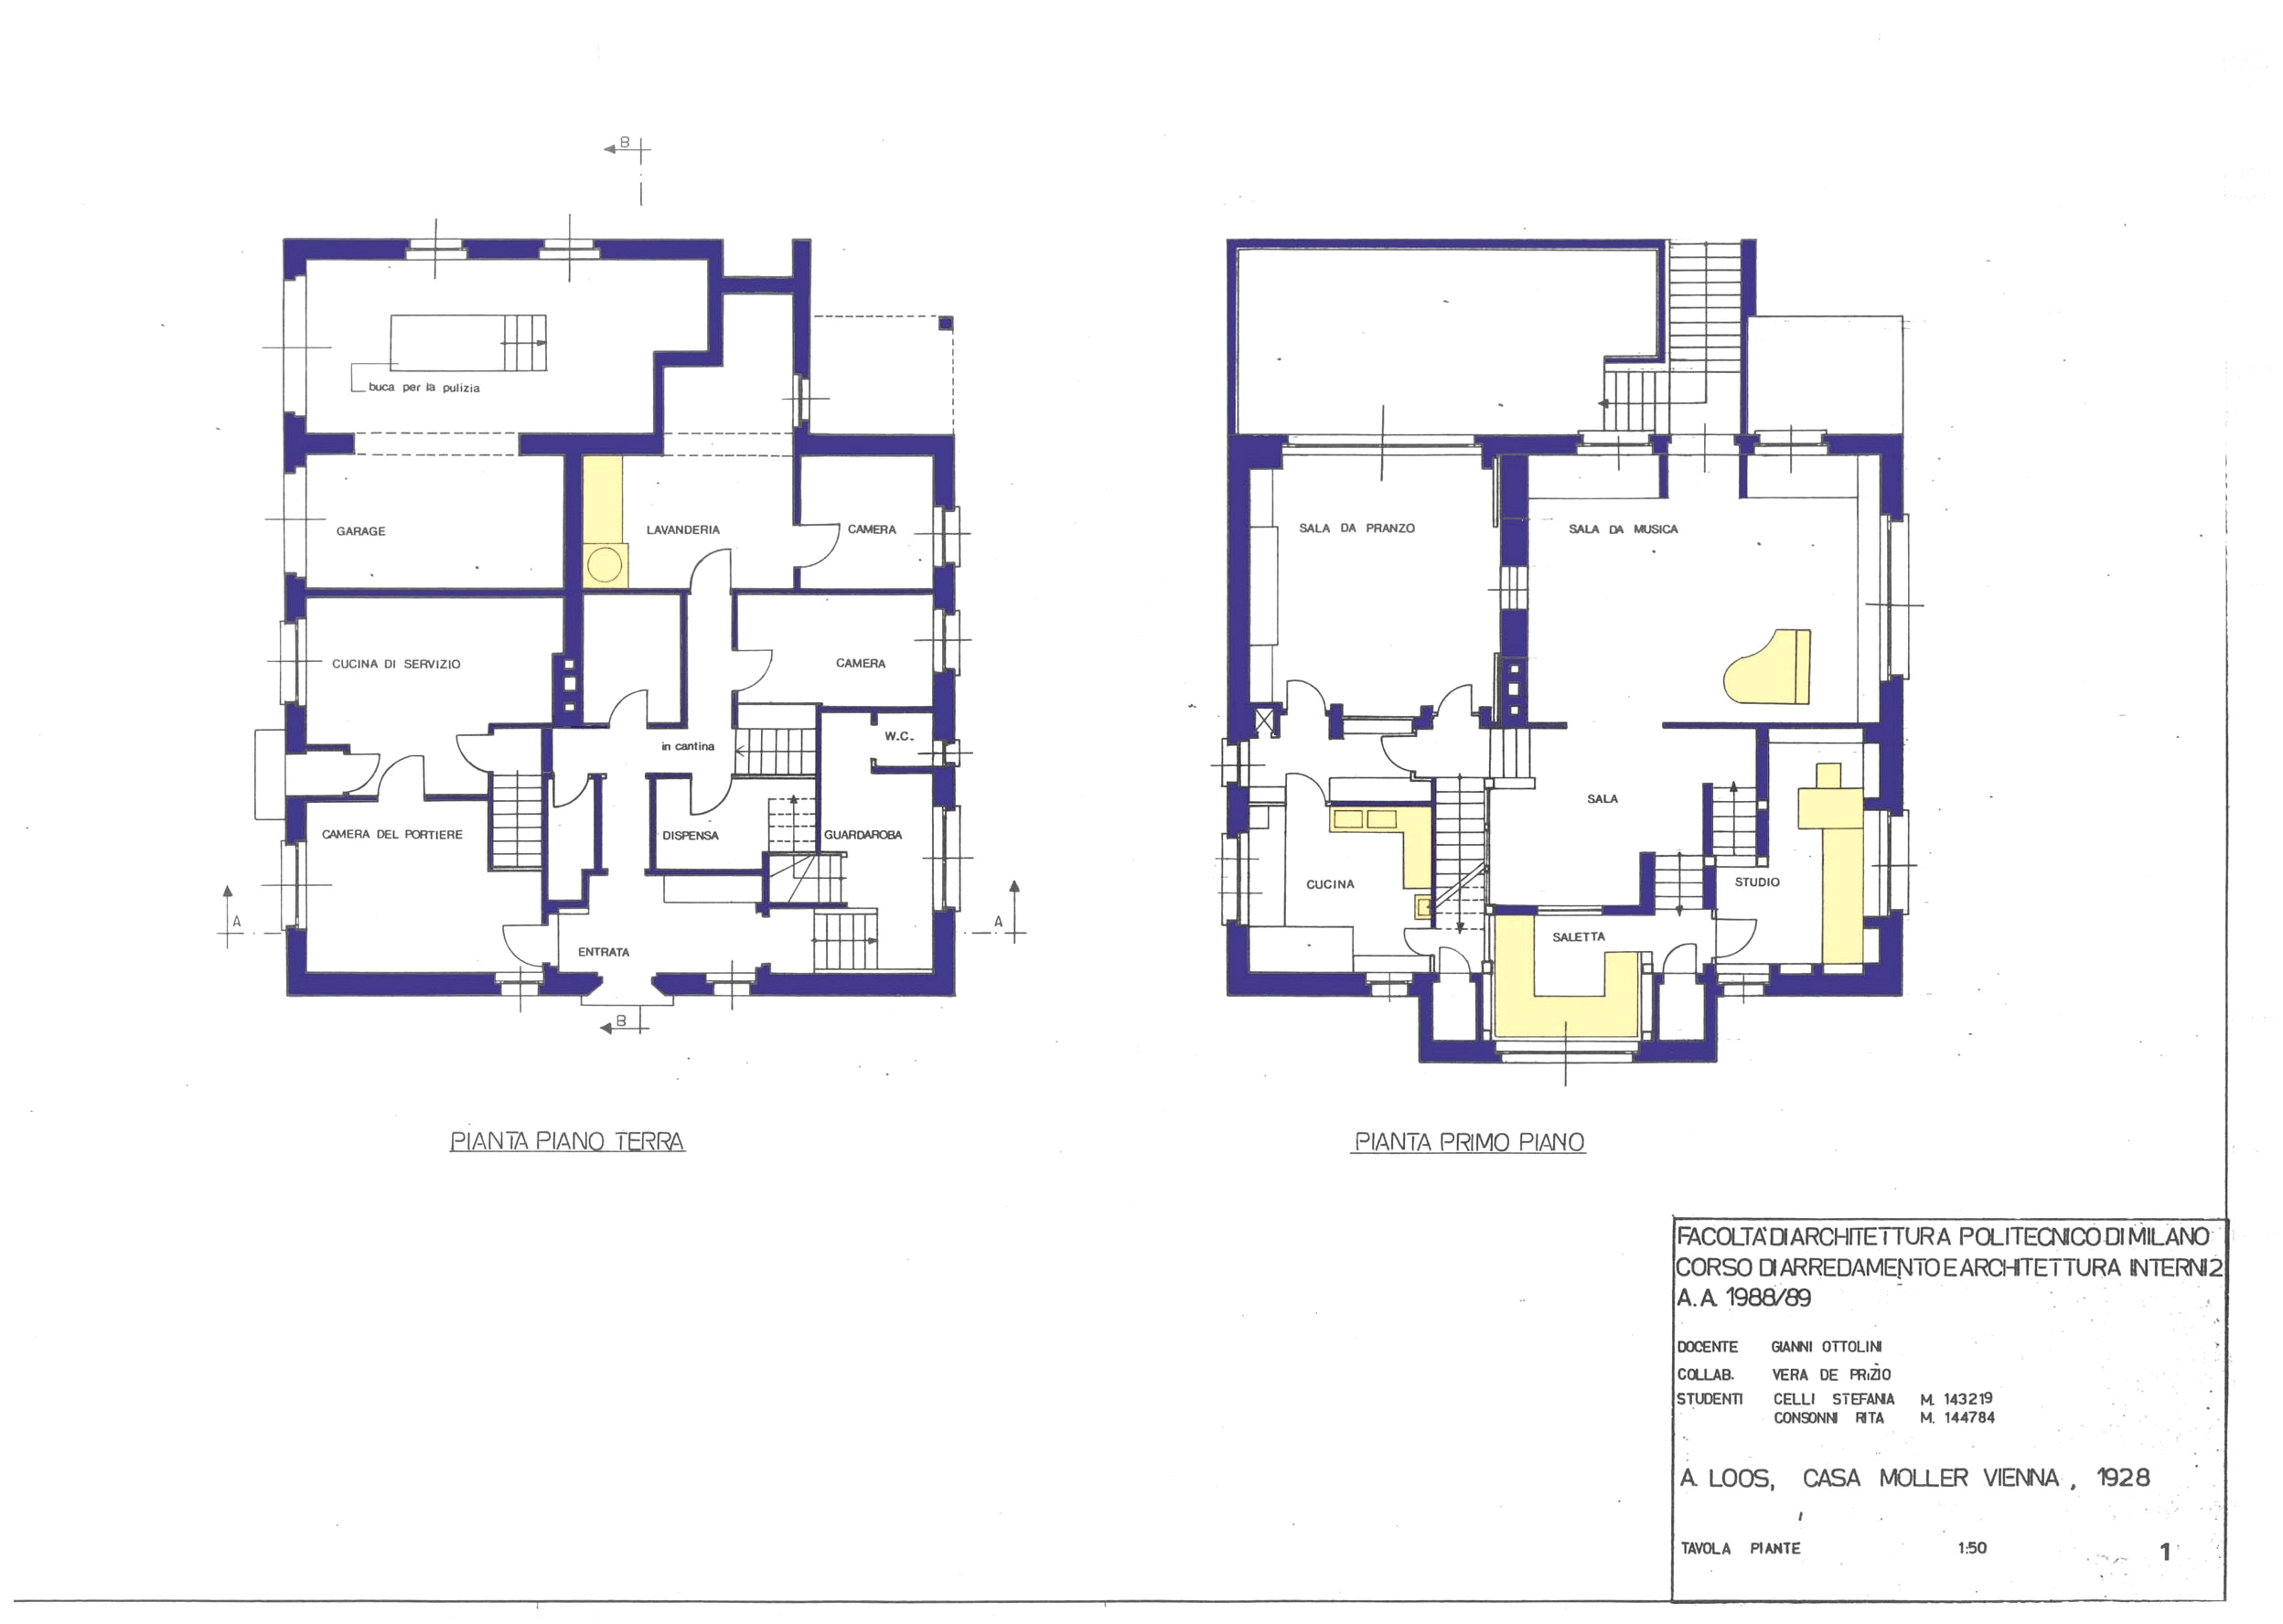 free concrete house plans designs beautiful free house plans designs lovely free floor plan modern house